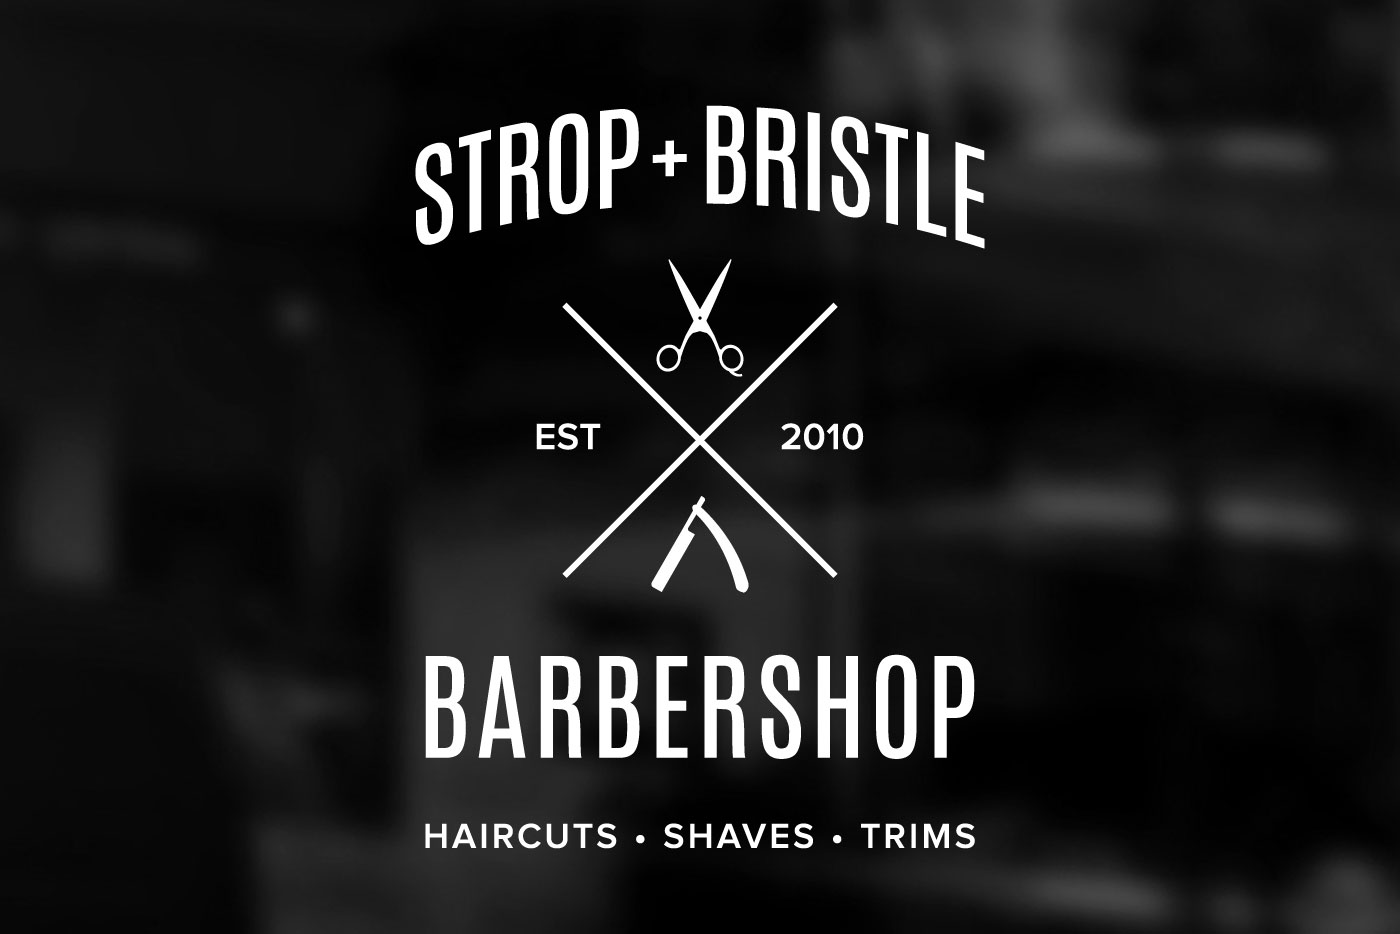 barbershop logo sign